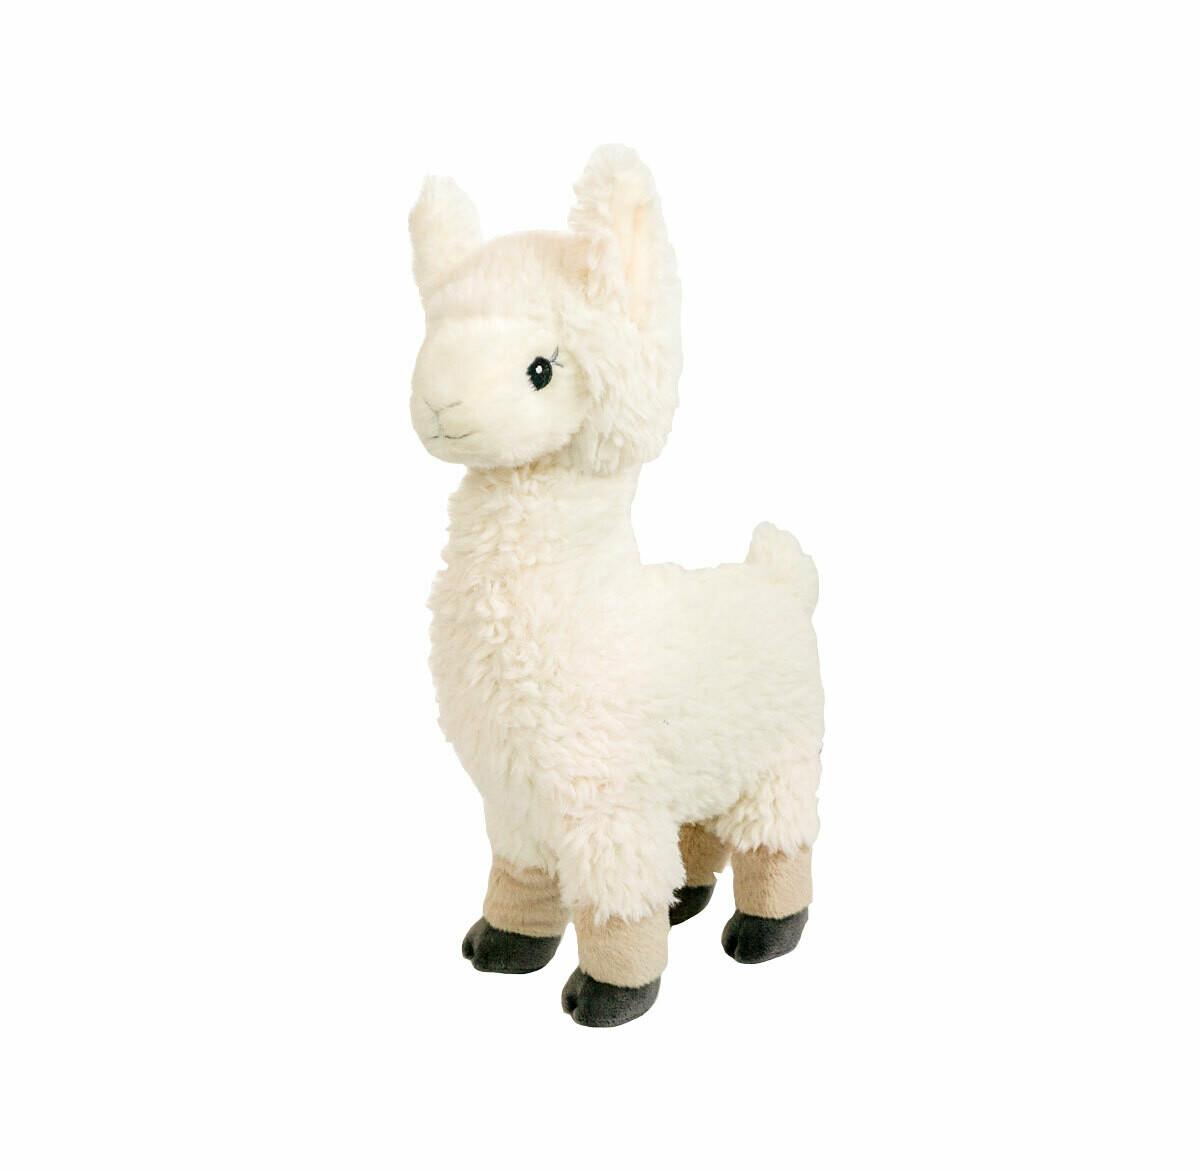 Teagan the Llama- Build-A-Plush Bundle - 16 inches